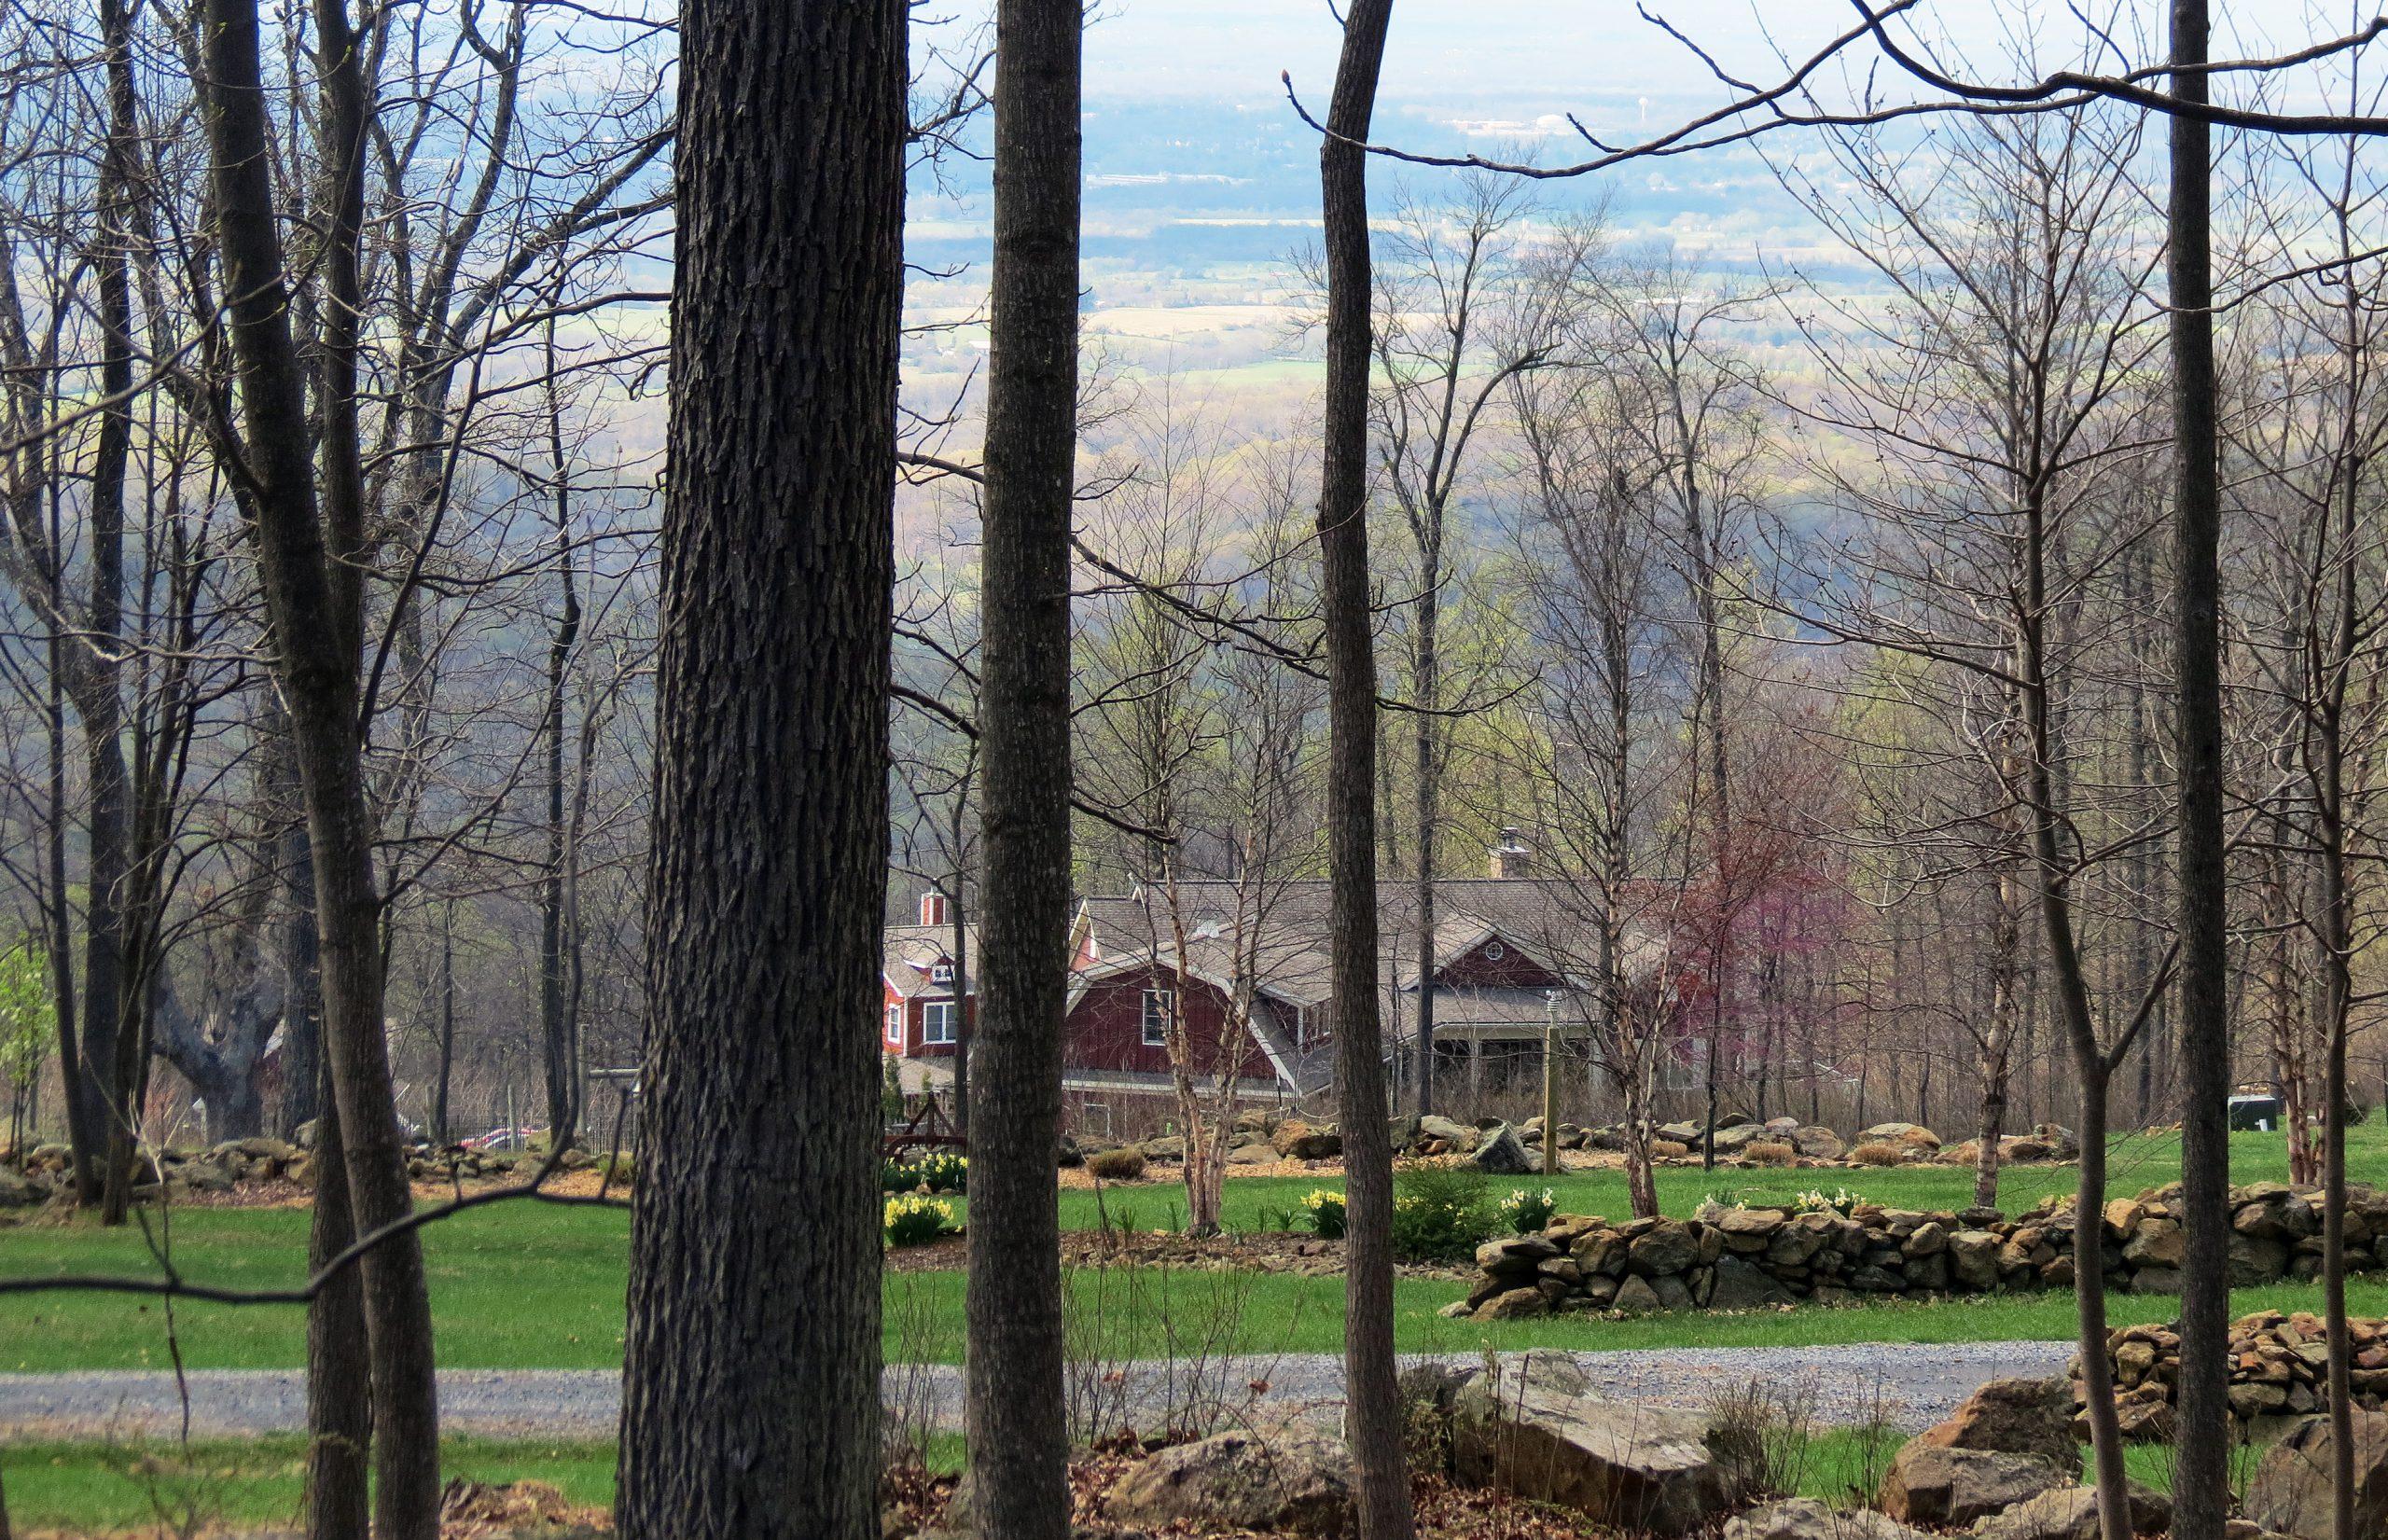 Bear's Den Rural Historic District